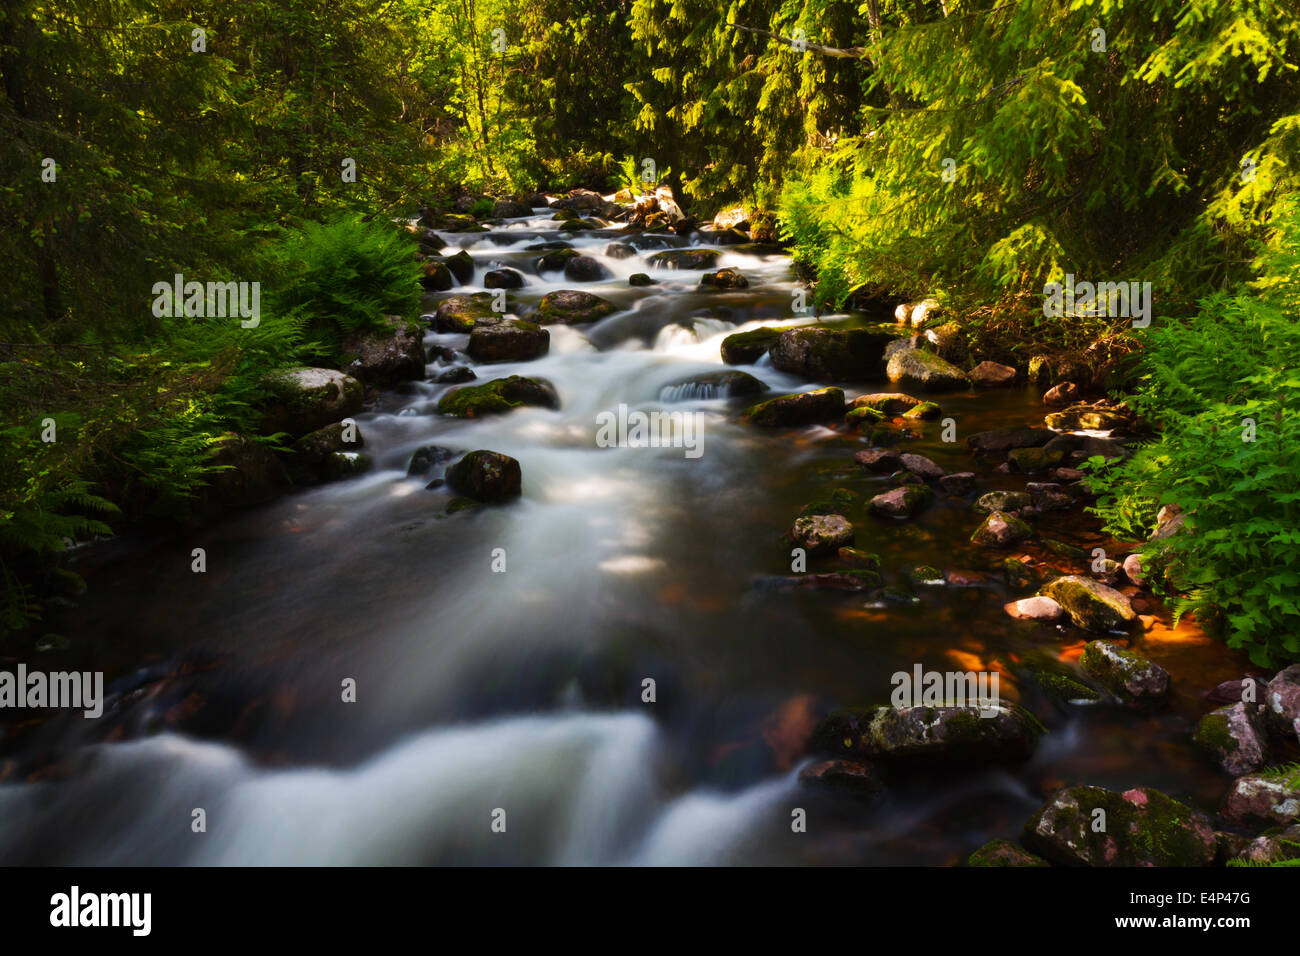 Long time exposure of water flowing in a stream at Njupeskär, Fulufjället, Dalarna, Sweden. Stock Photo